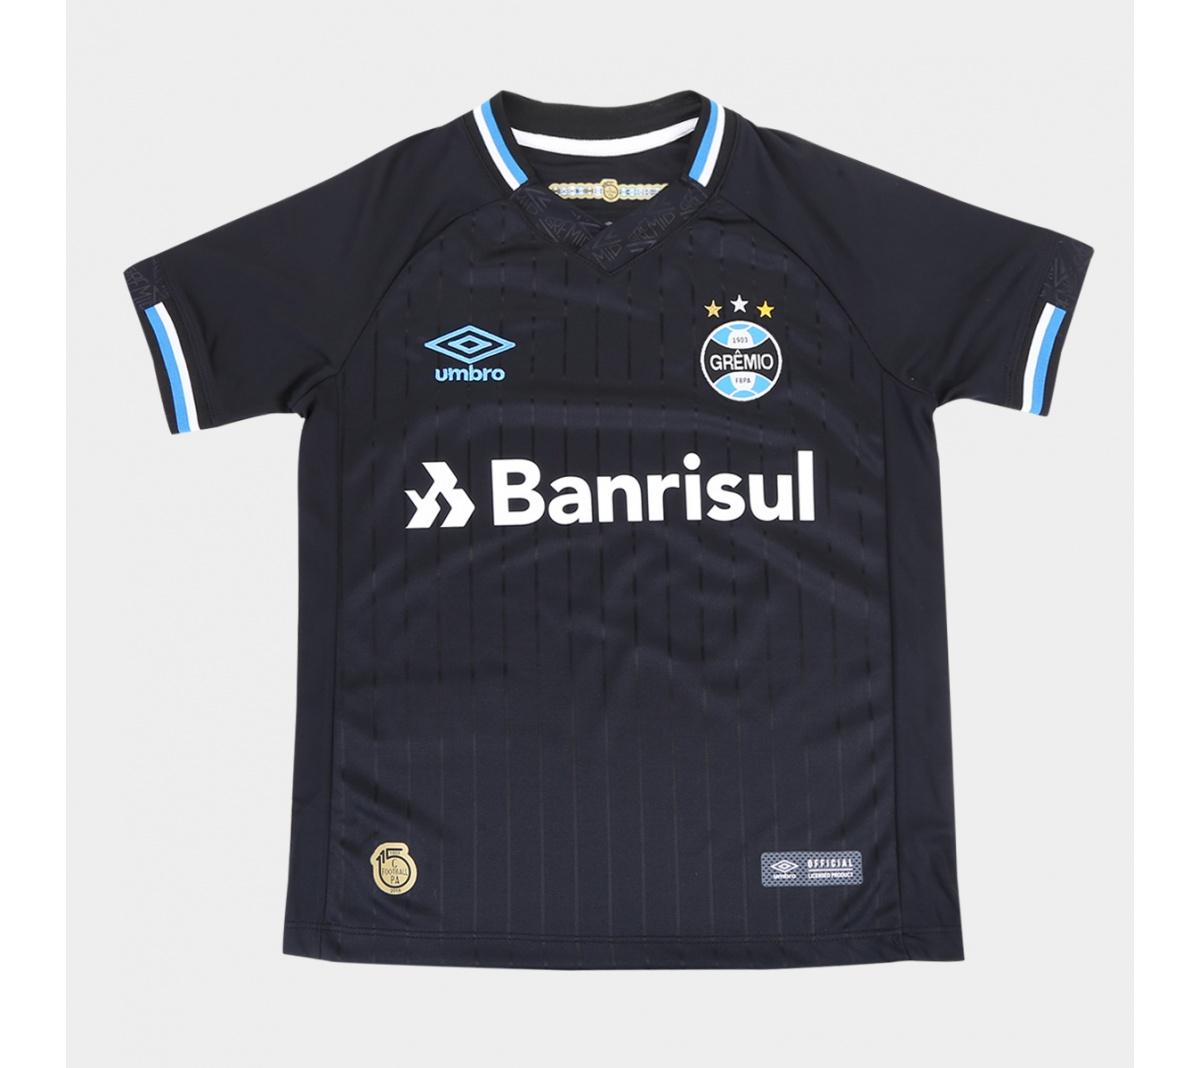 Camisa Umbro Gremio III 2018 Infantil Camisa Umbro Gremio III 2018 Infantil  ... 12383c627a09c